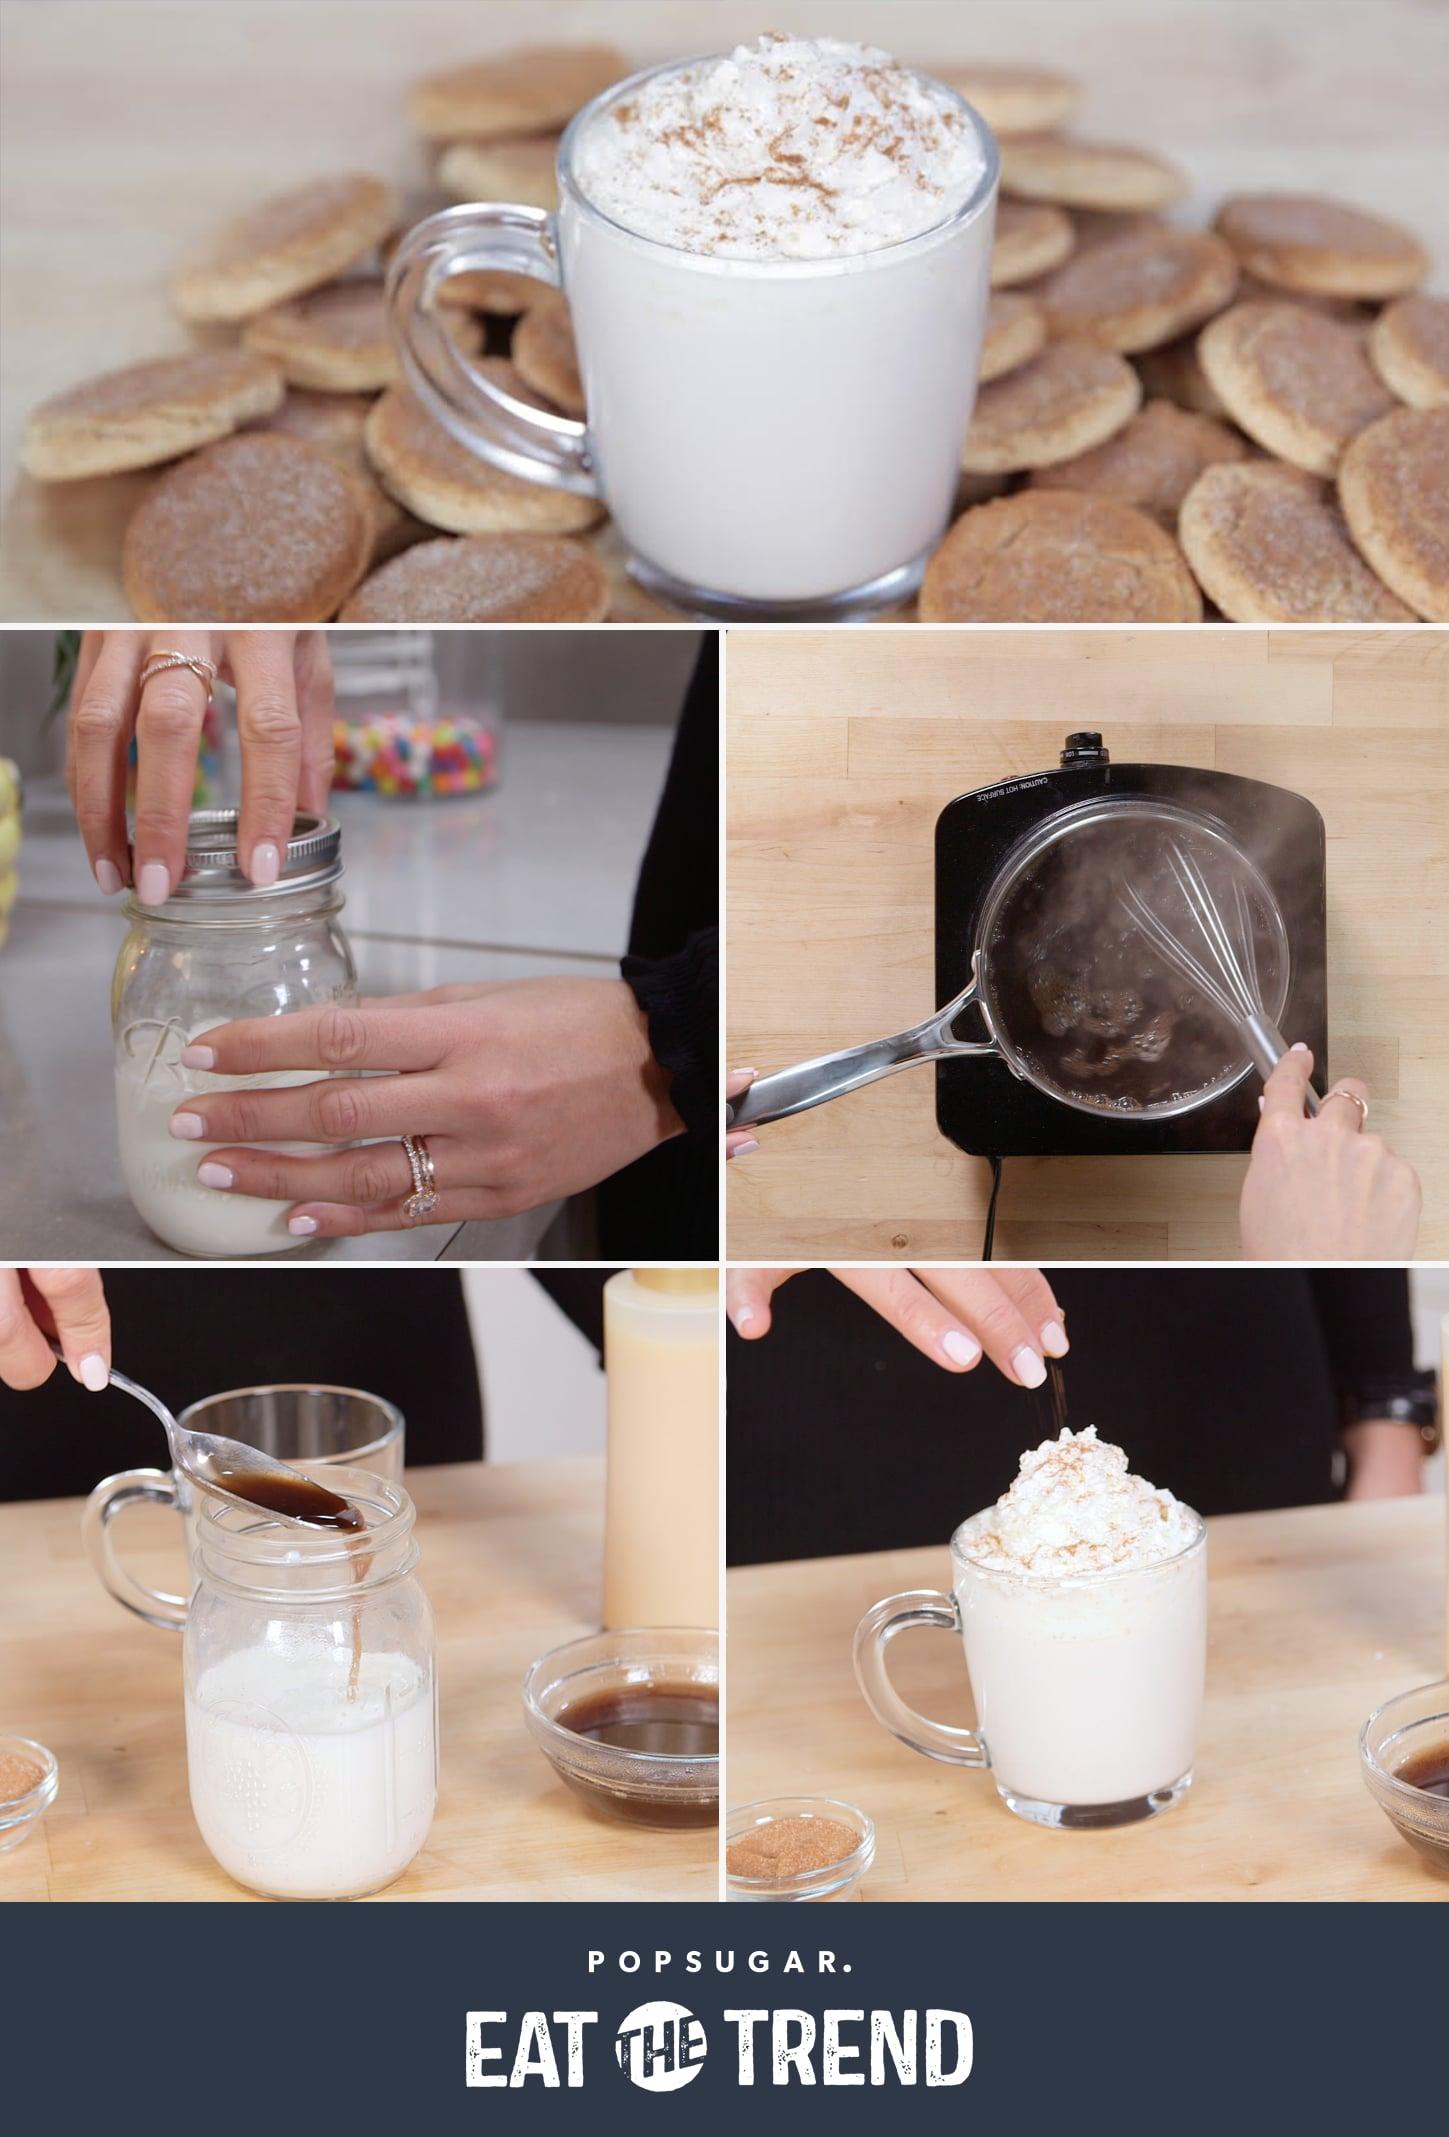 Copycat Starbucks Snickerdoodle Hot Cocoa Recipe | POPSUGAR Food